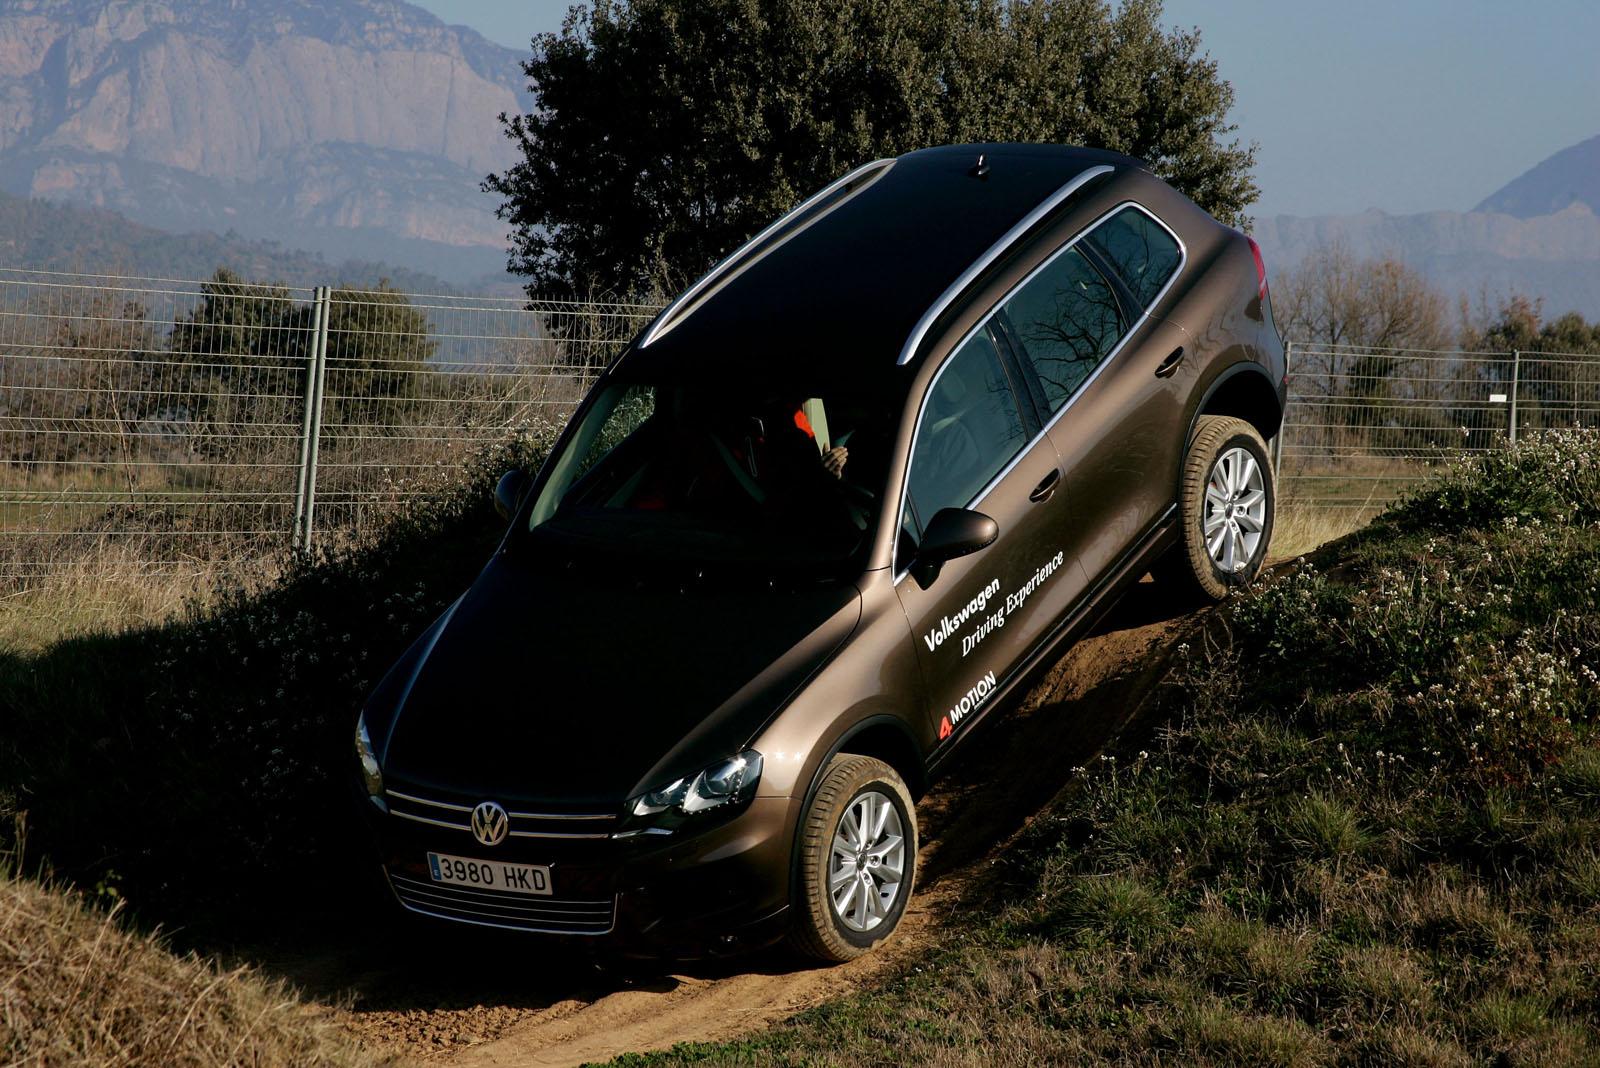 foto touareg off road 5 volkswagen driving experience 2014. Black Bedroom Furniture Sets. Home Design Ideas